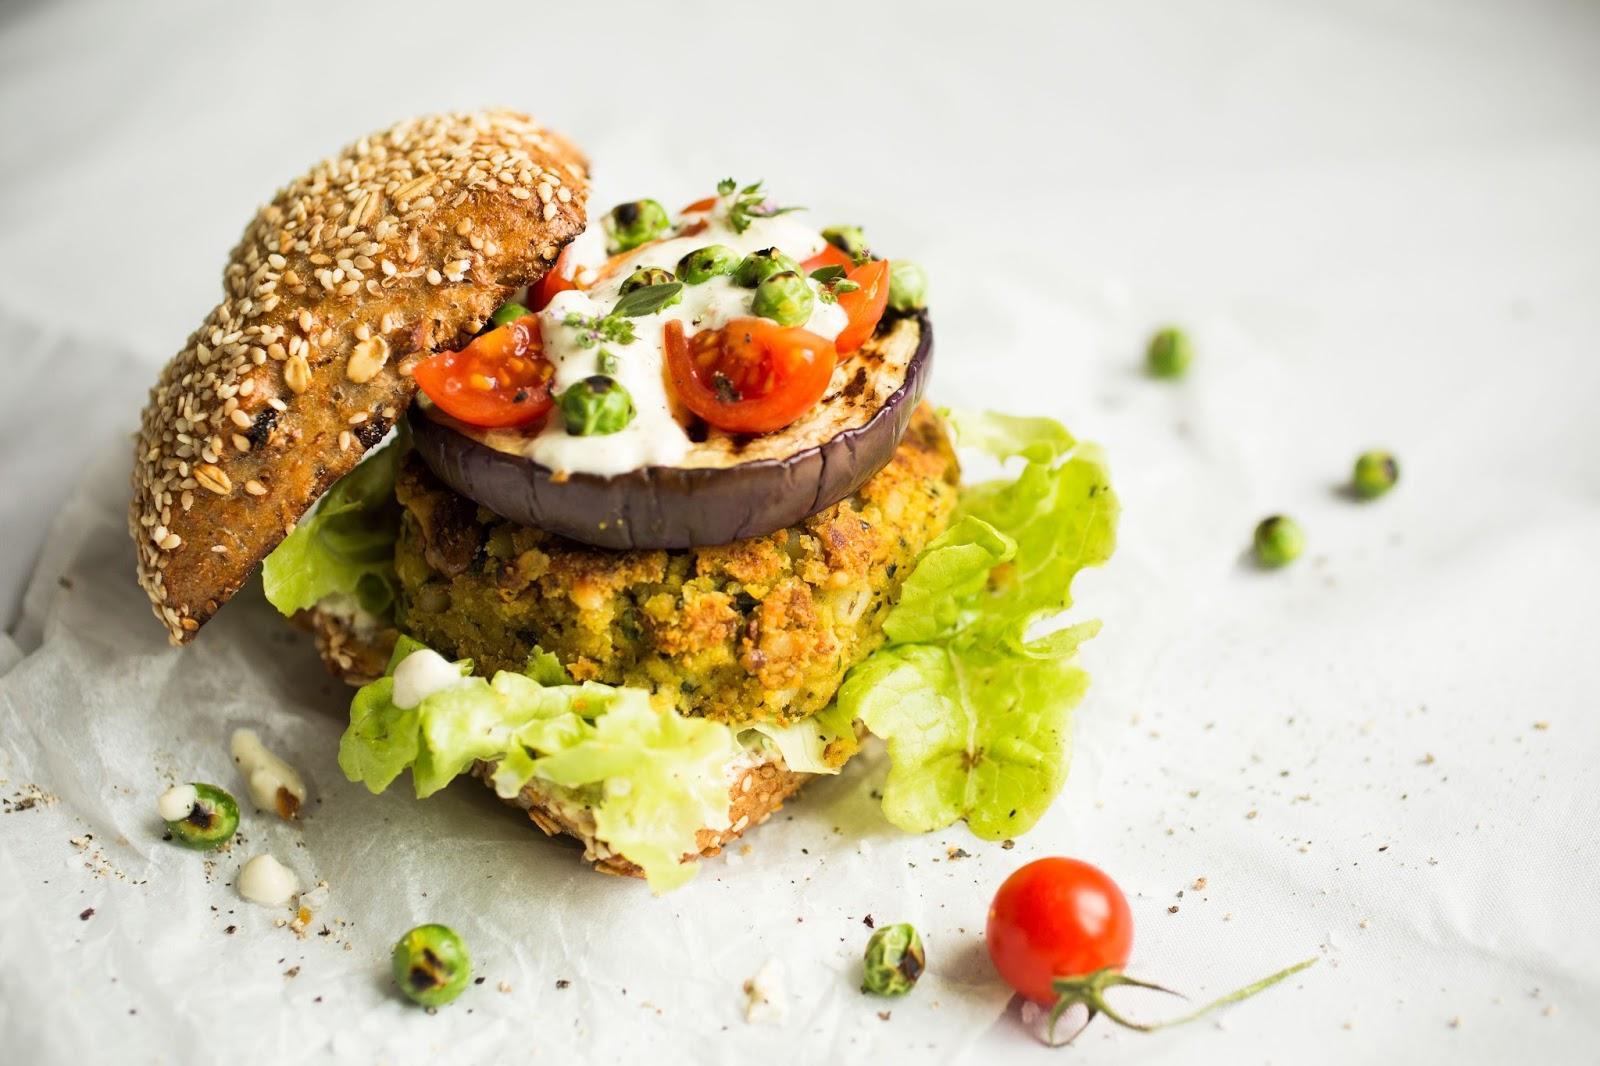 The Byk: ziarno burger